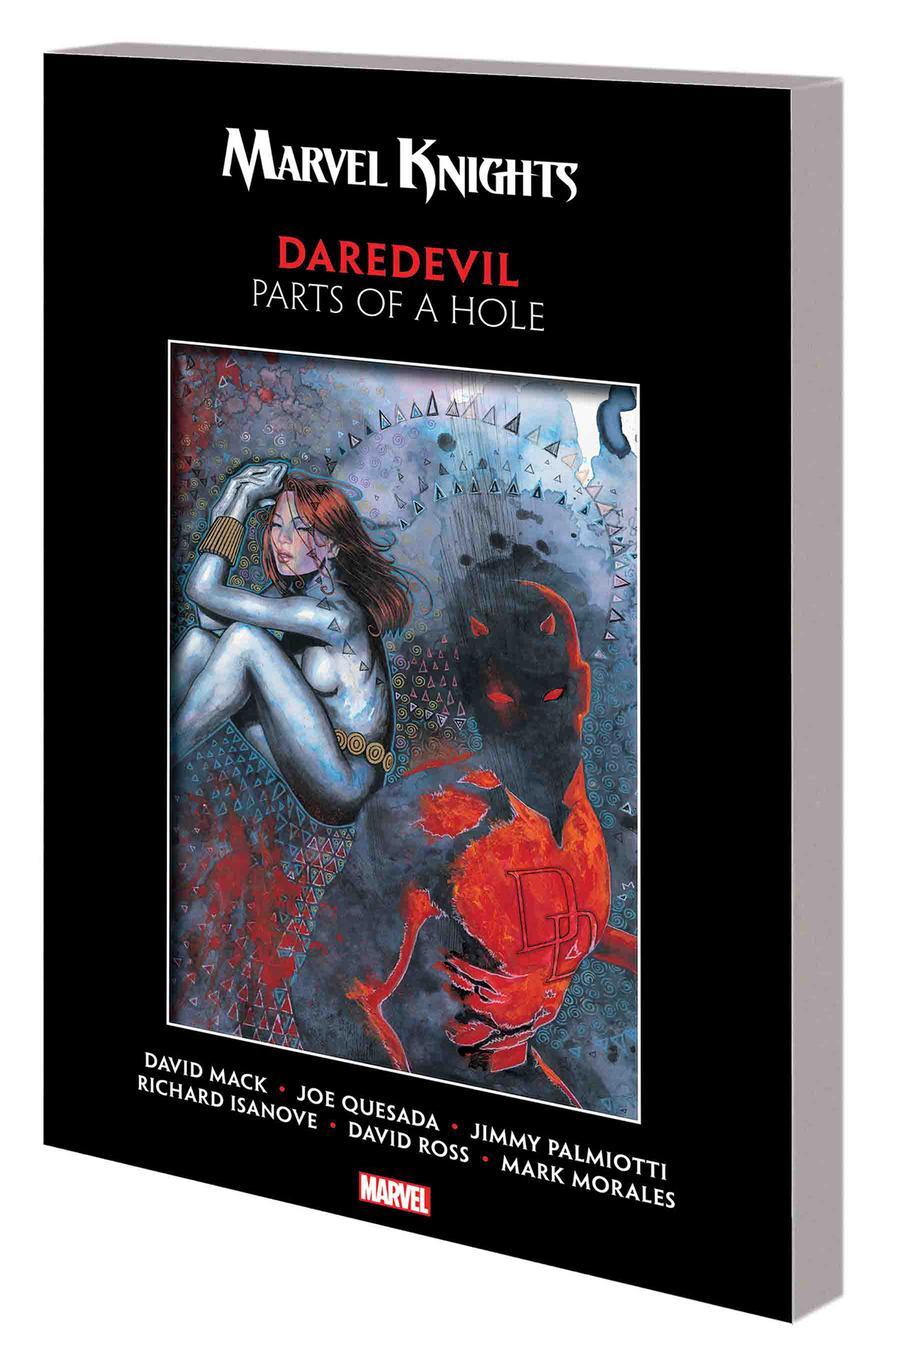 Marvel Knights Daredevil By David Mack & Joe Quesada Parts Of A Hole TP